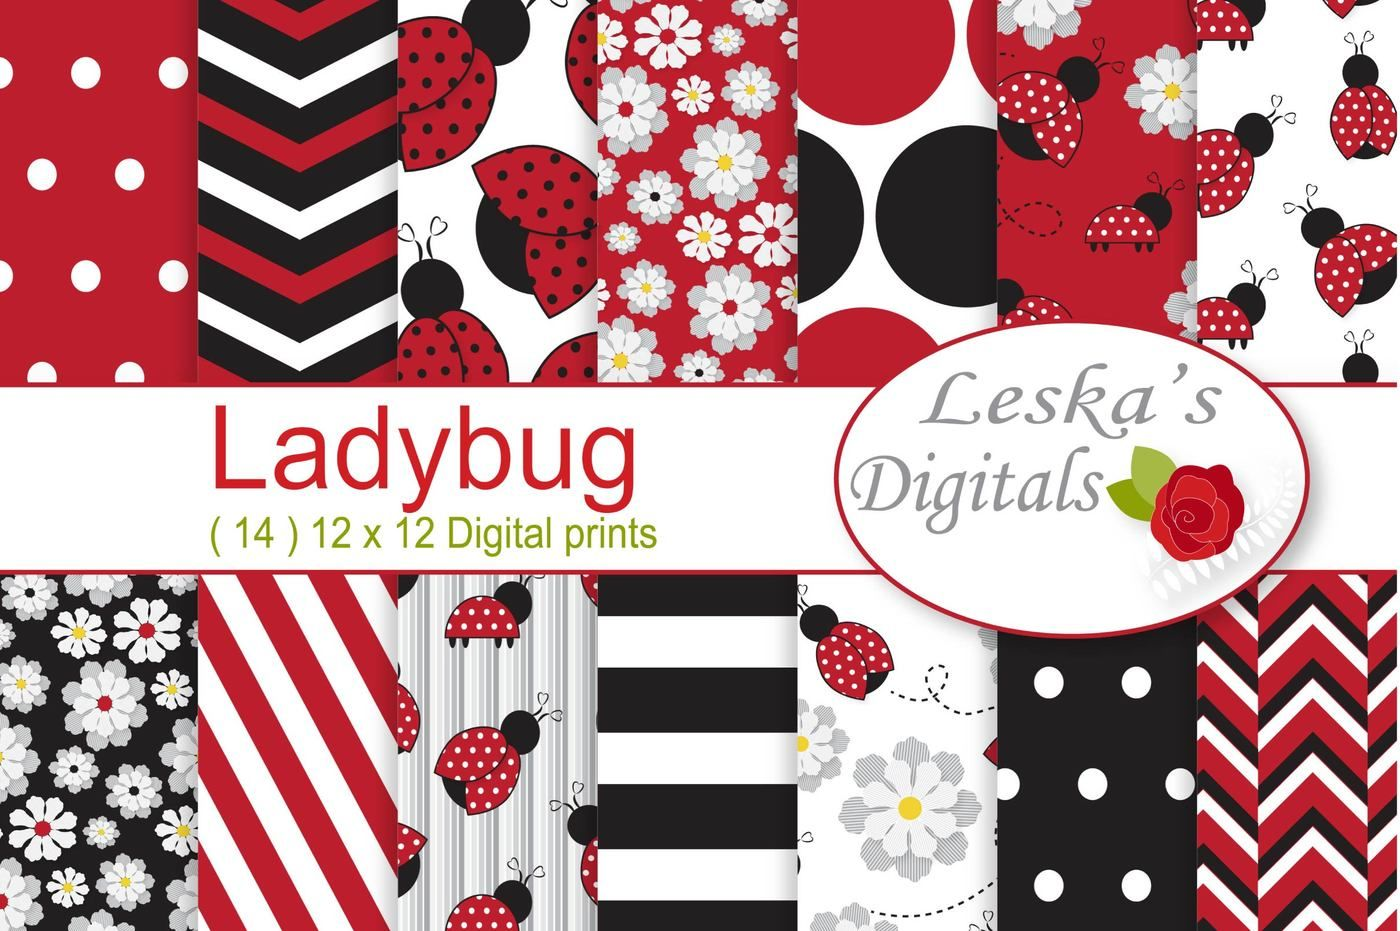 ladybug digital paper packleska's digitals